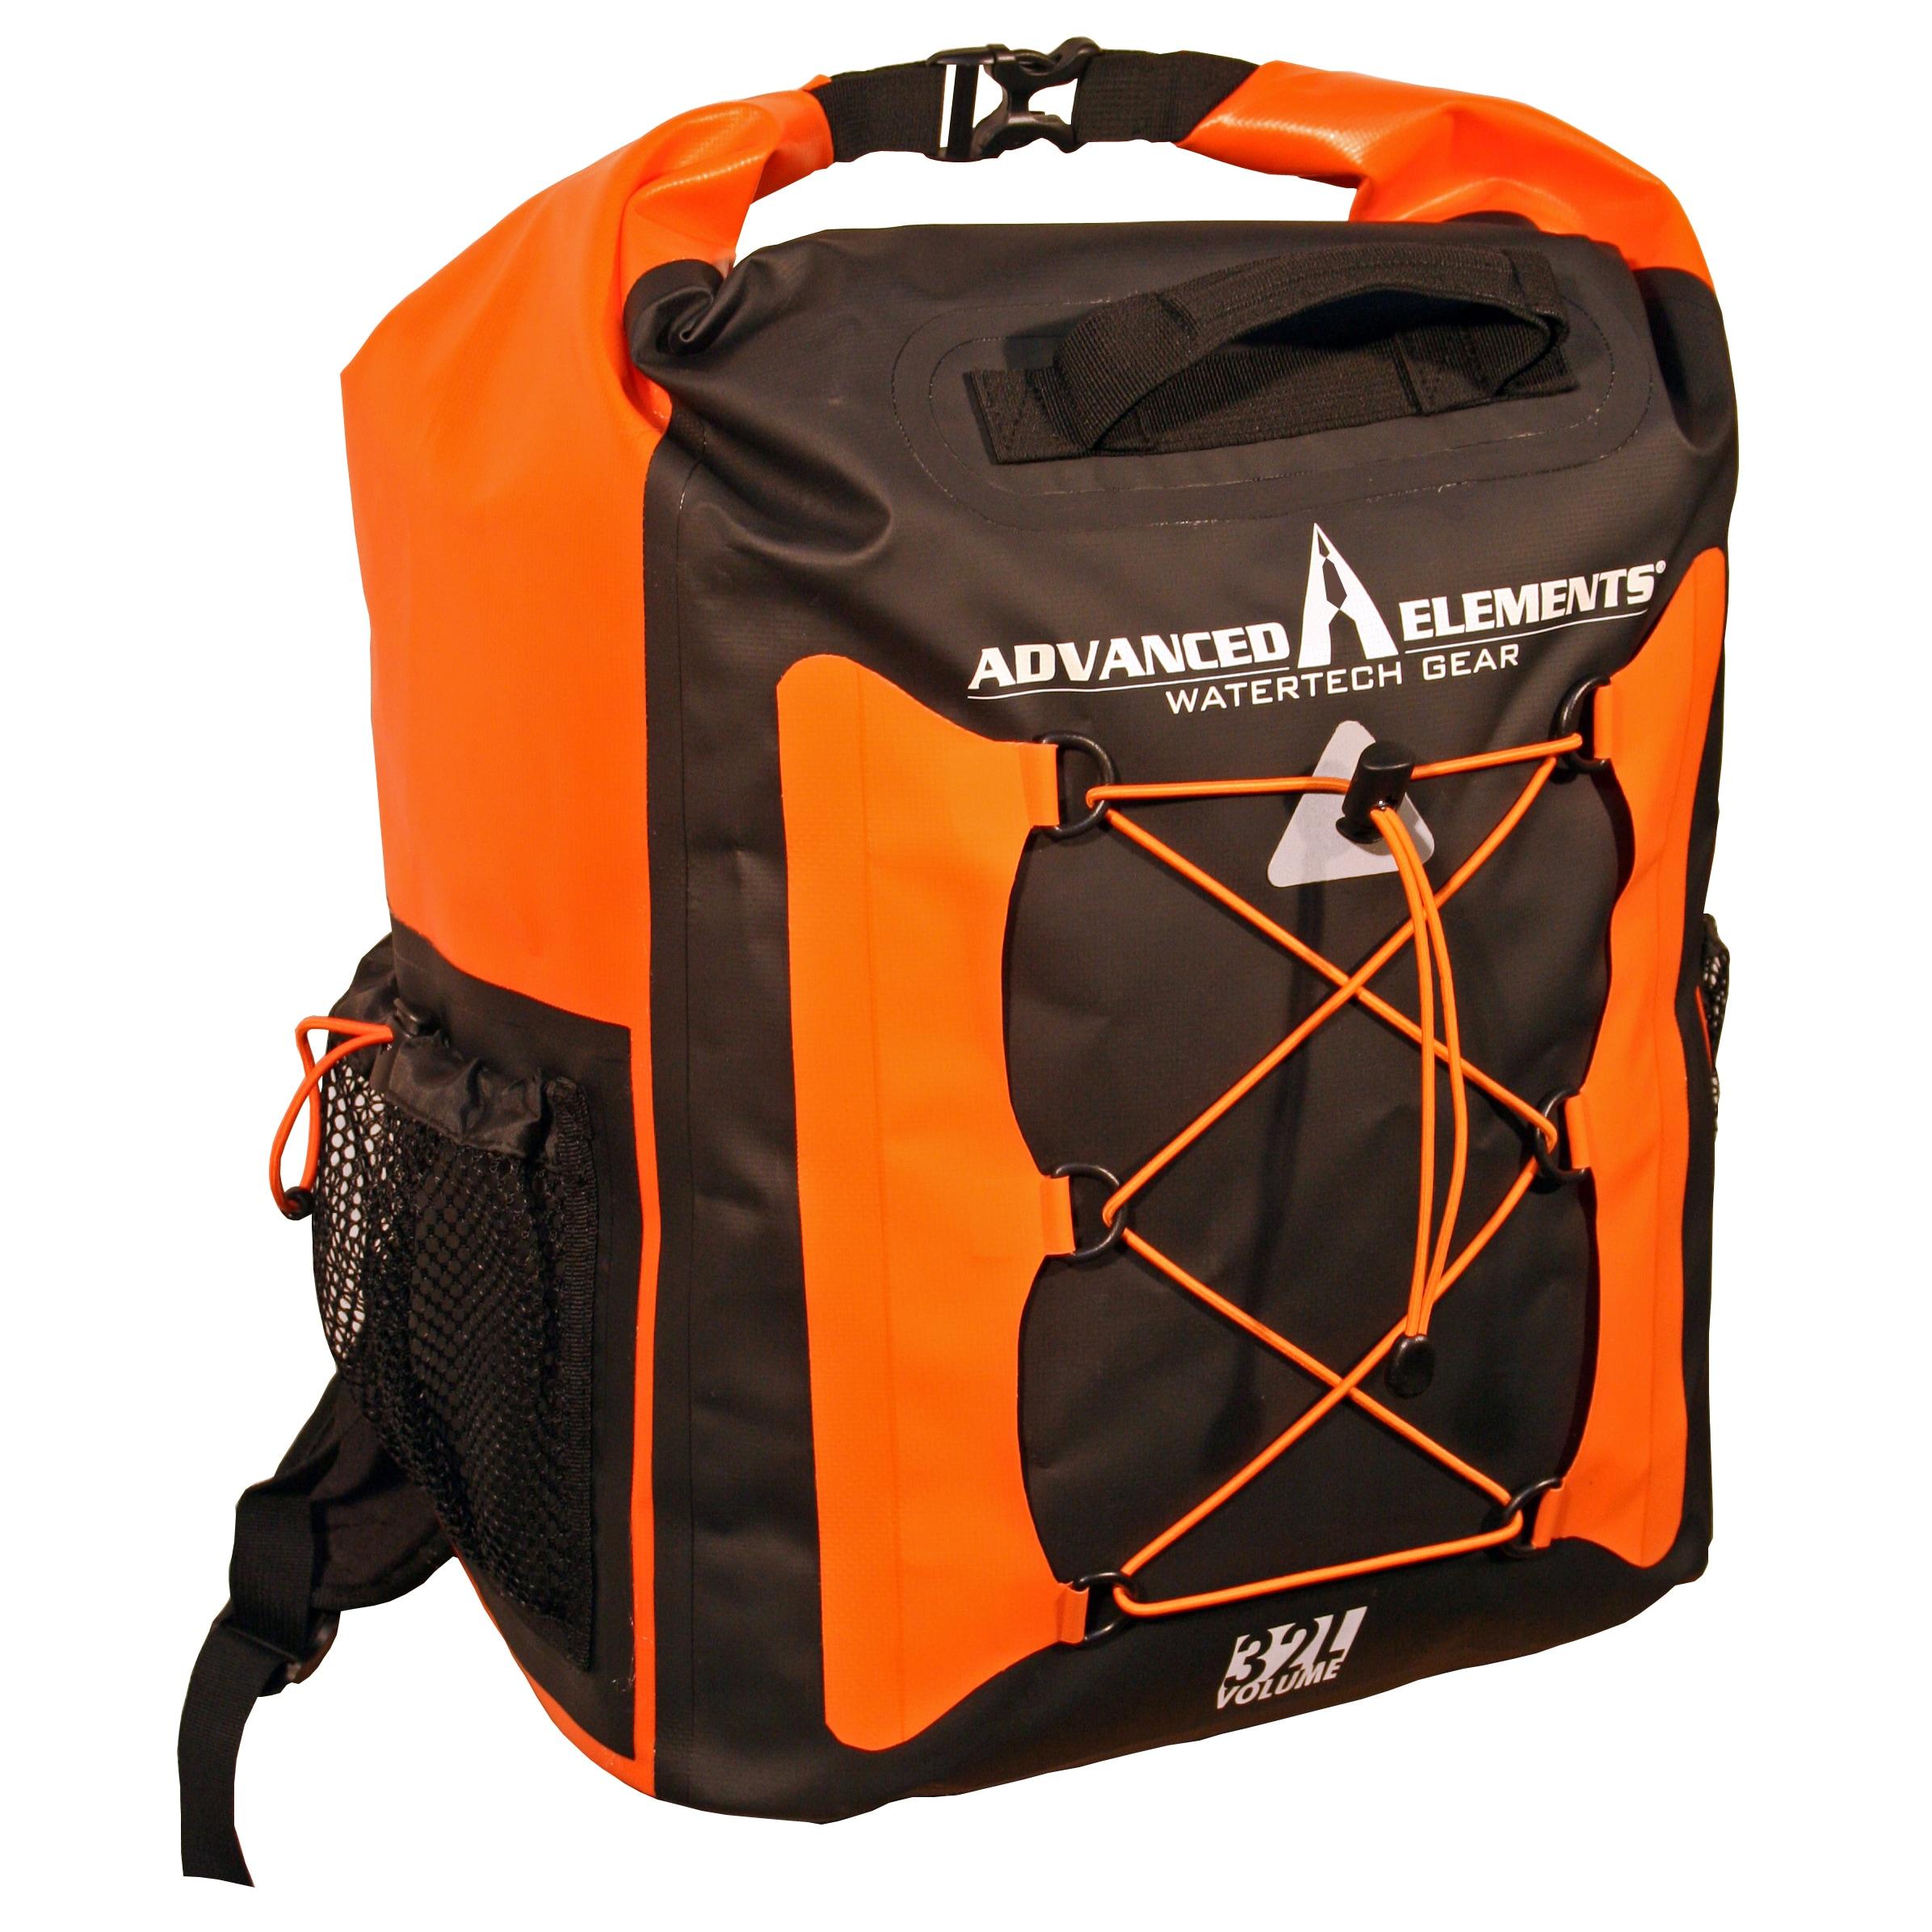 Advanced Elements CargoPak Orange and Black PVC Cargo Bag...